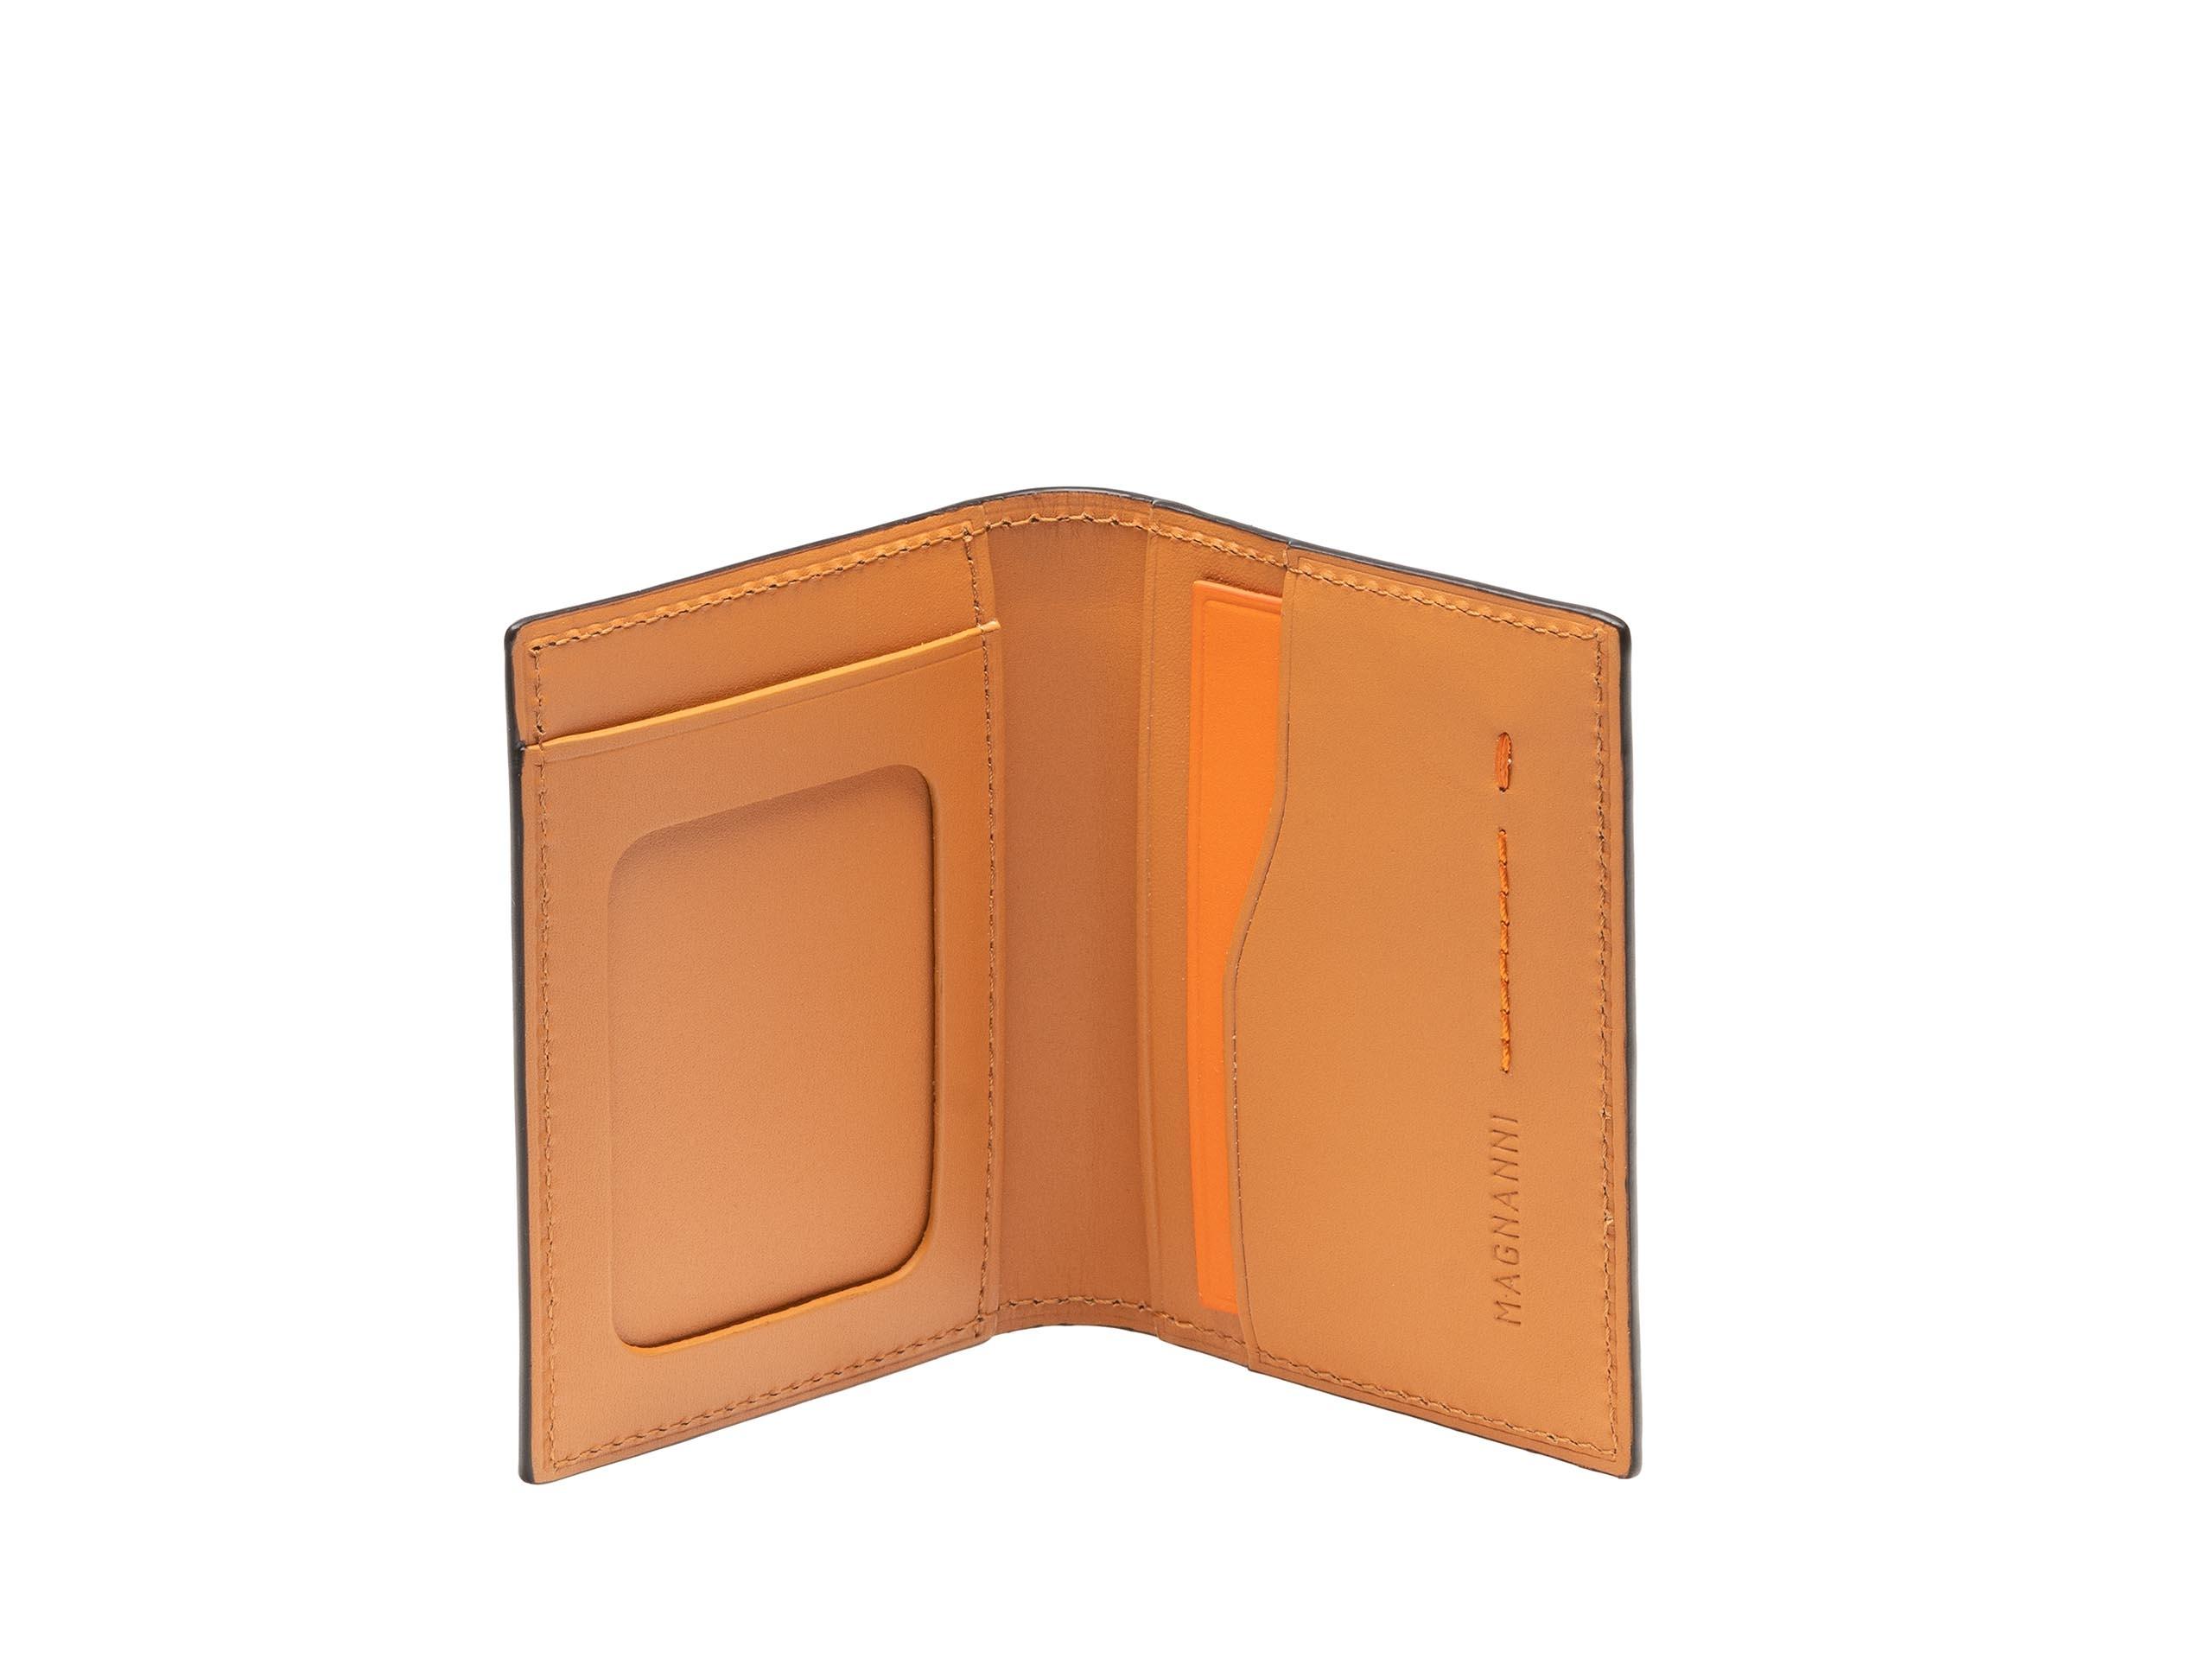 Inside of the Card Fold Wallet